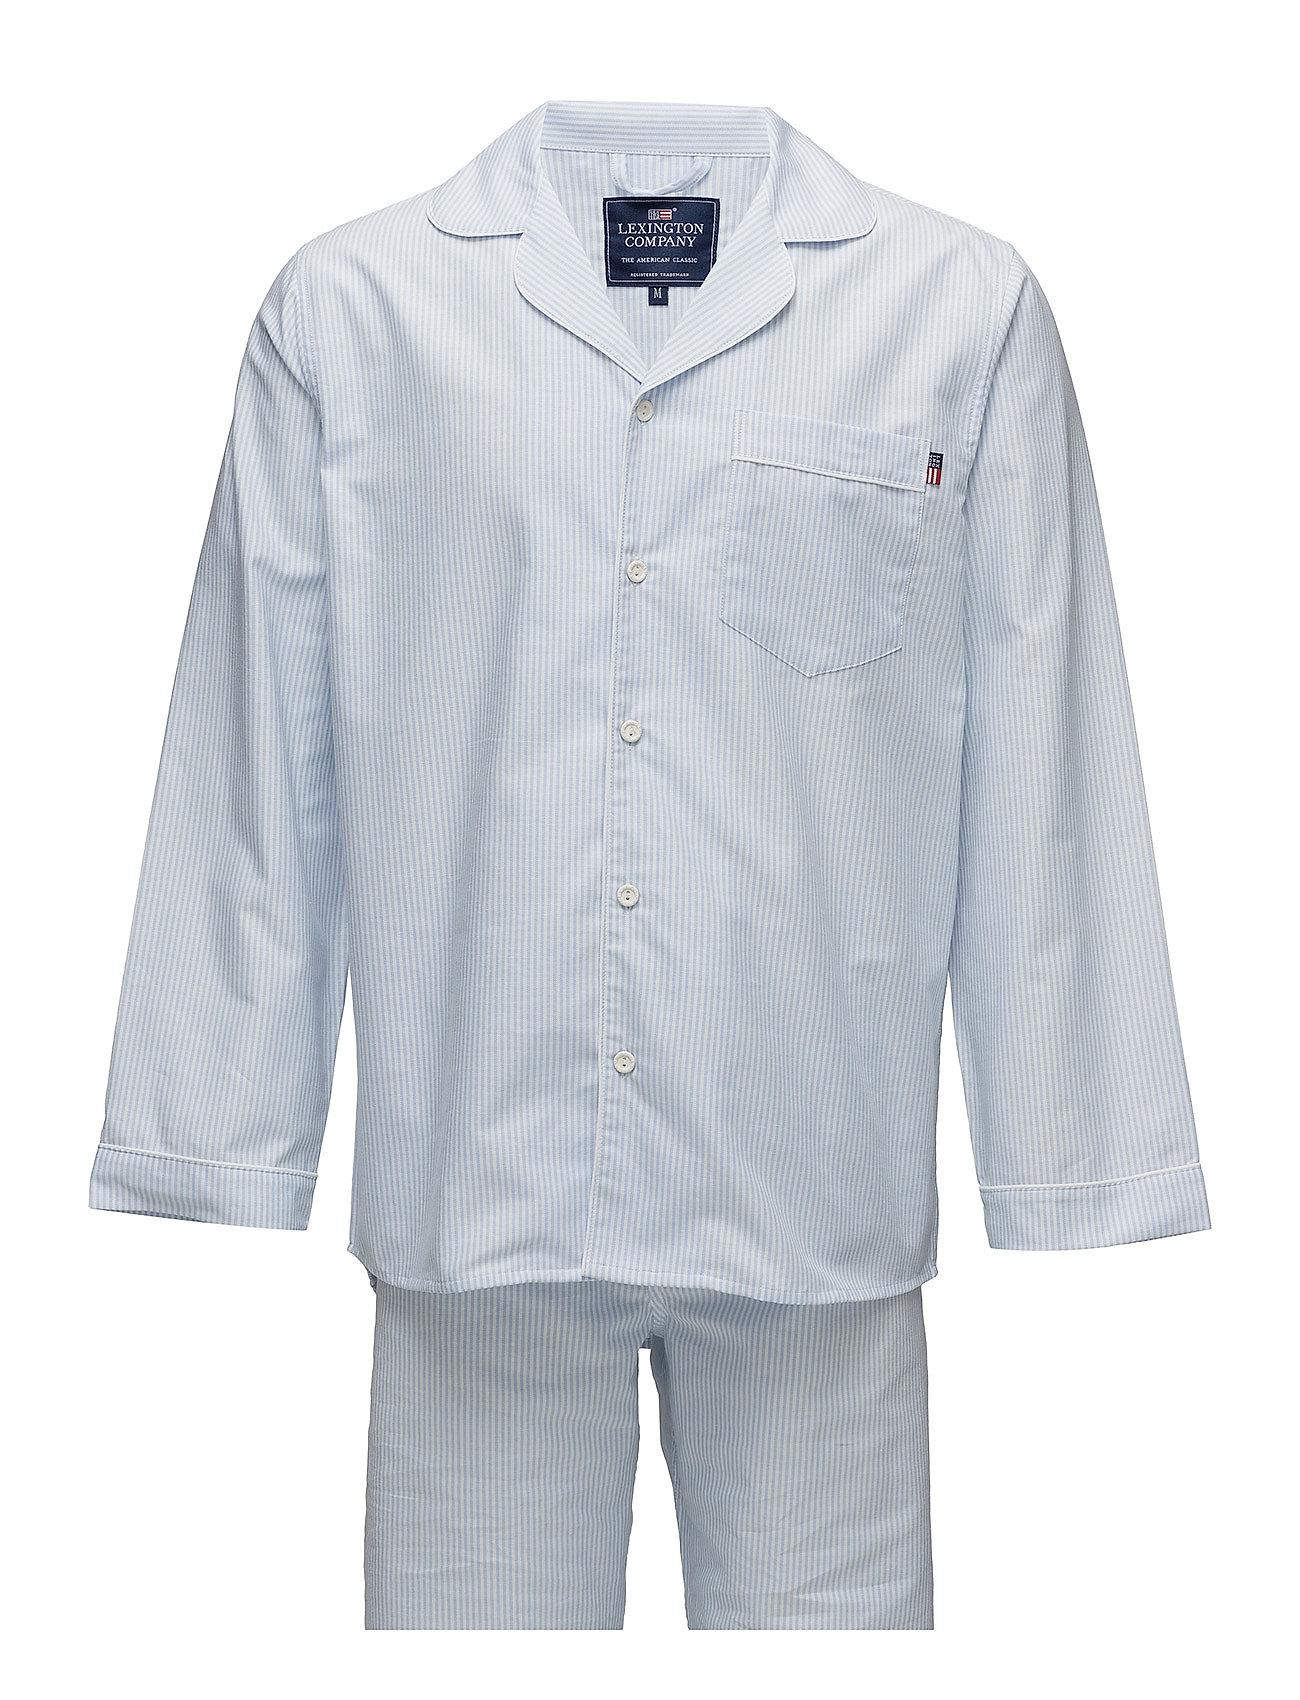 Lexington Home American Authentic Pajama - LT BLUE/WHITE